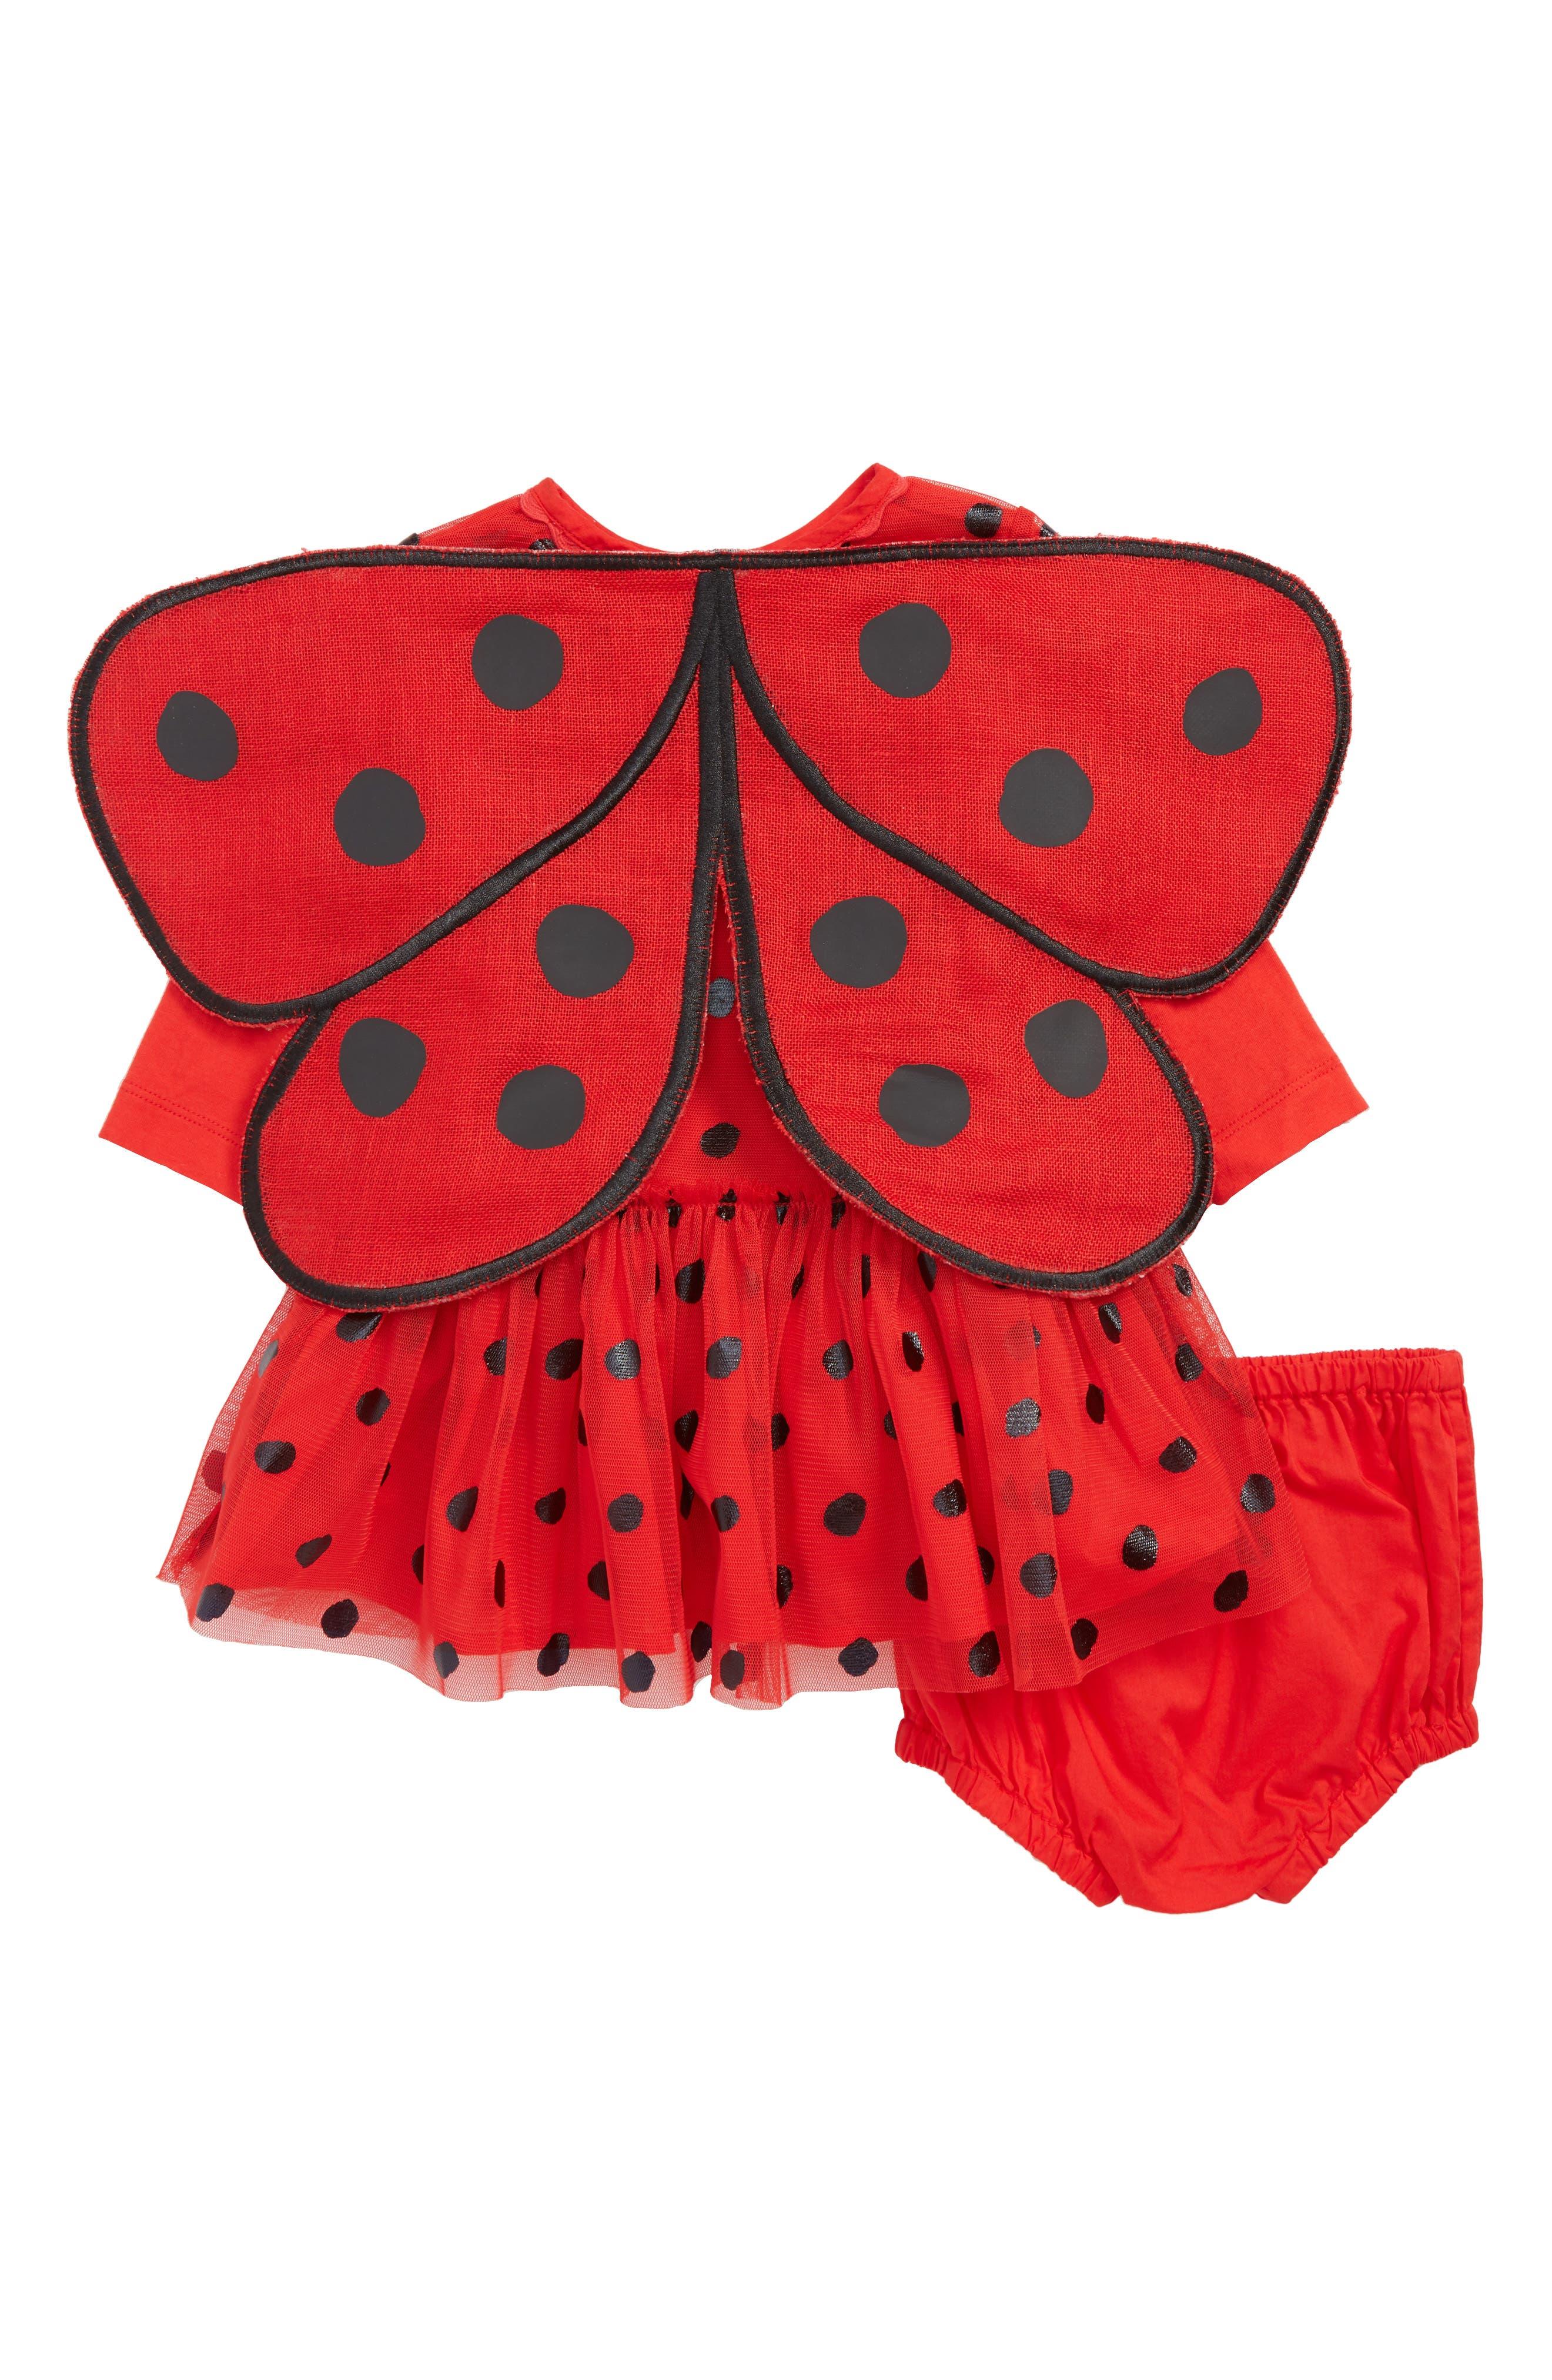 Mouse Dress & Wings Set,                             Alternate thumbnail 2, color,                             Red Black